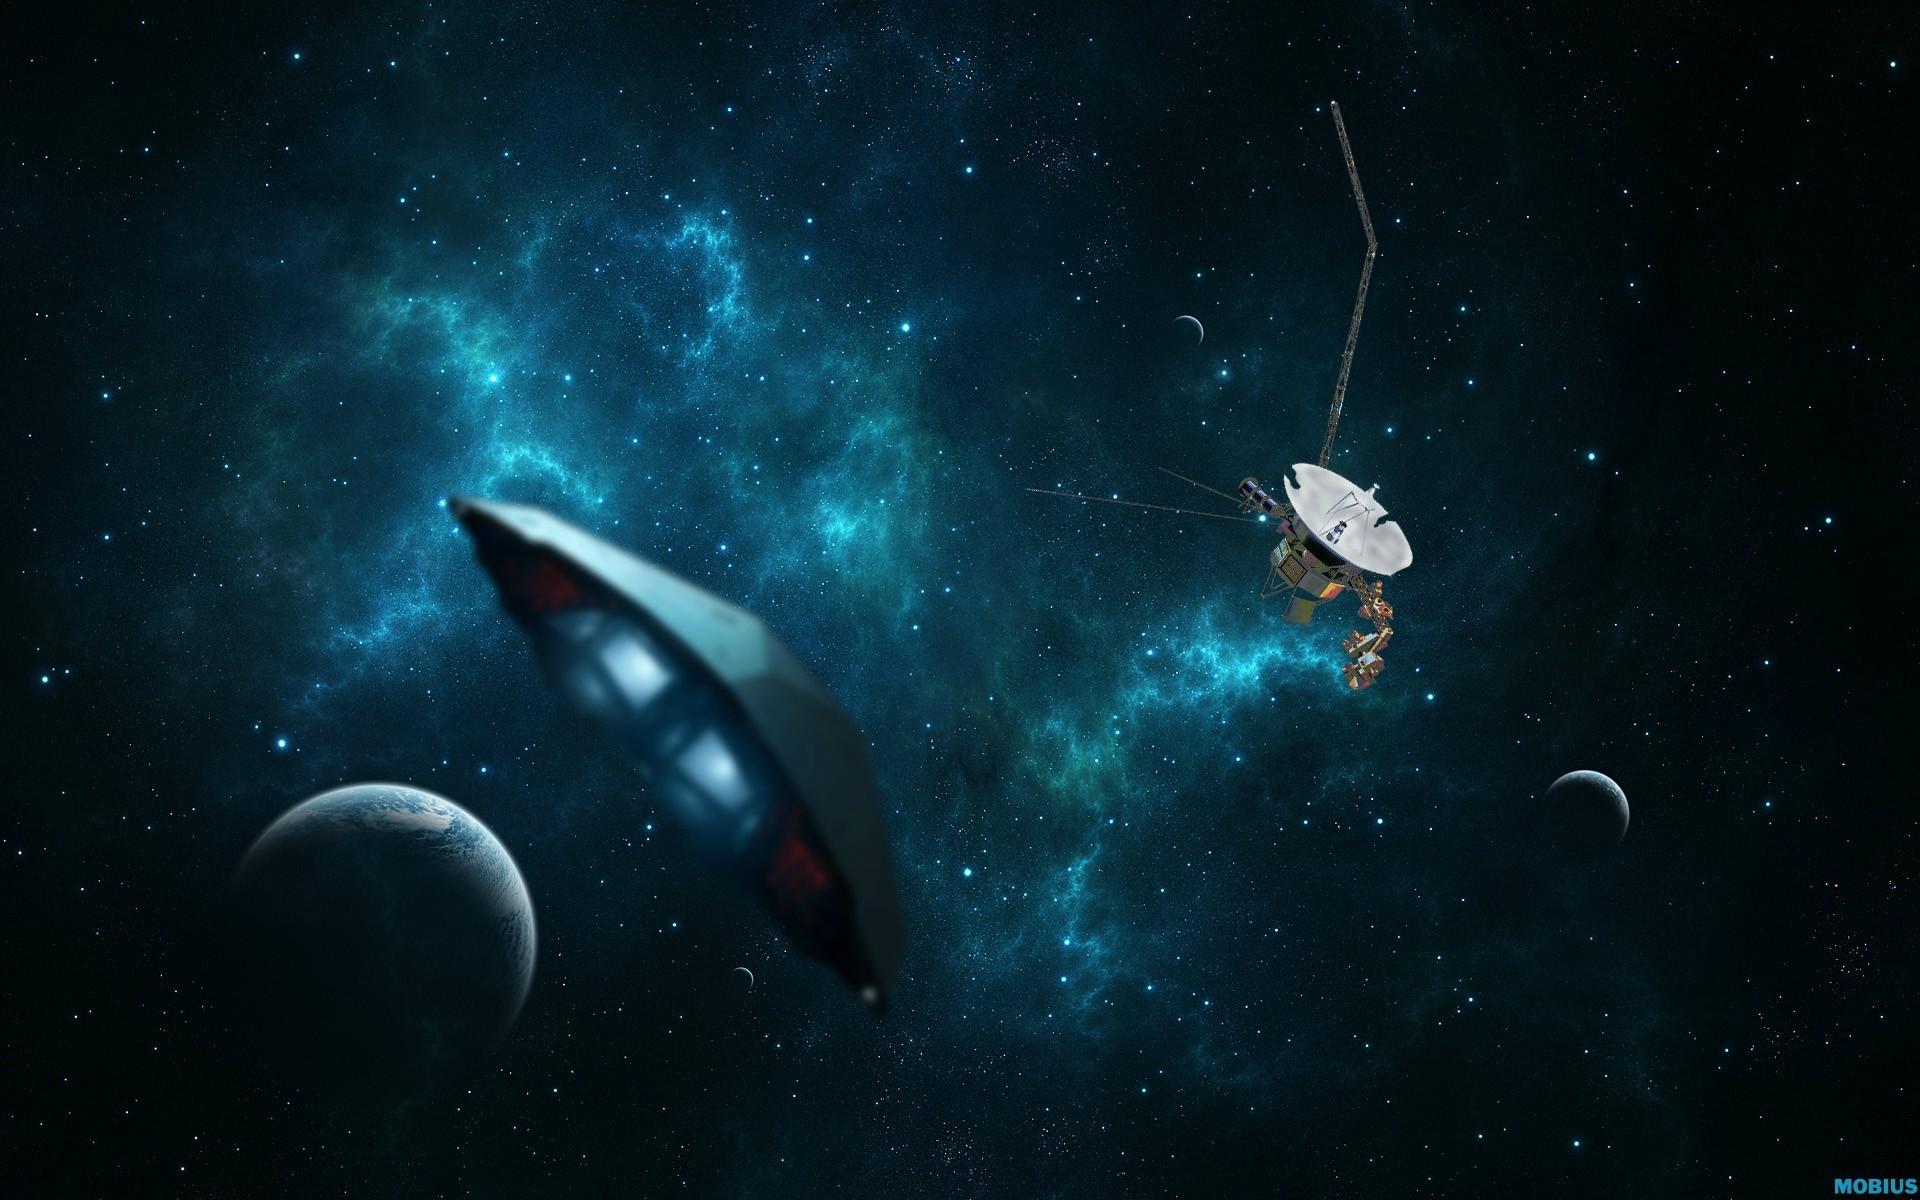 ELITE DANGEROUS sci-fi spaceship game space v wallpaper | |  167539 | WallpaperUP